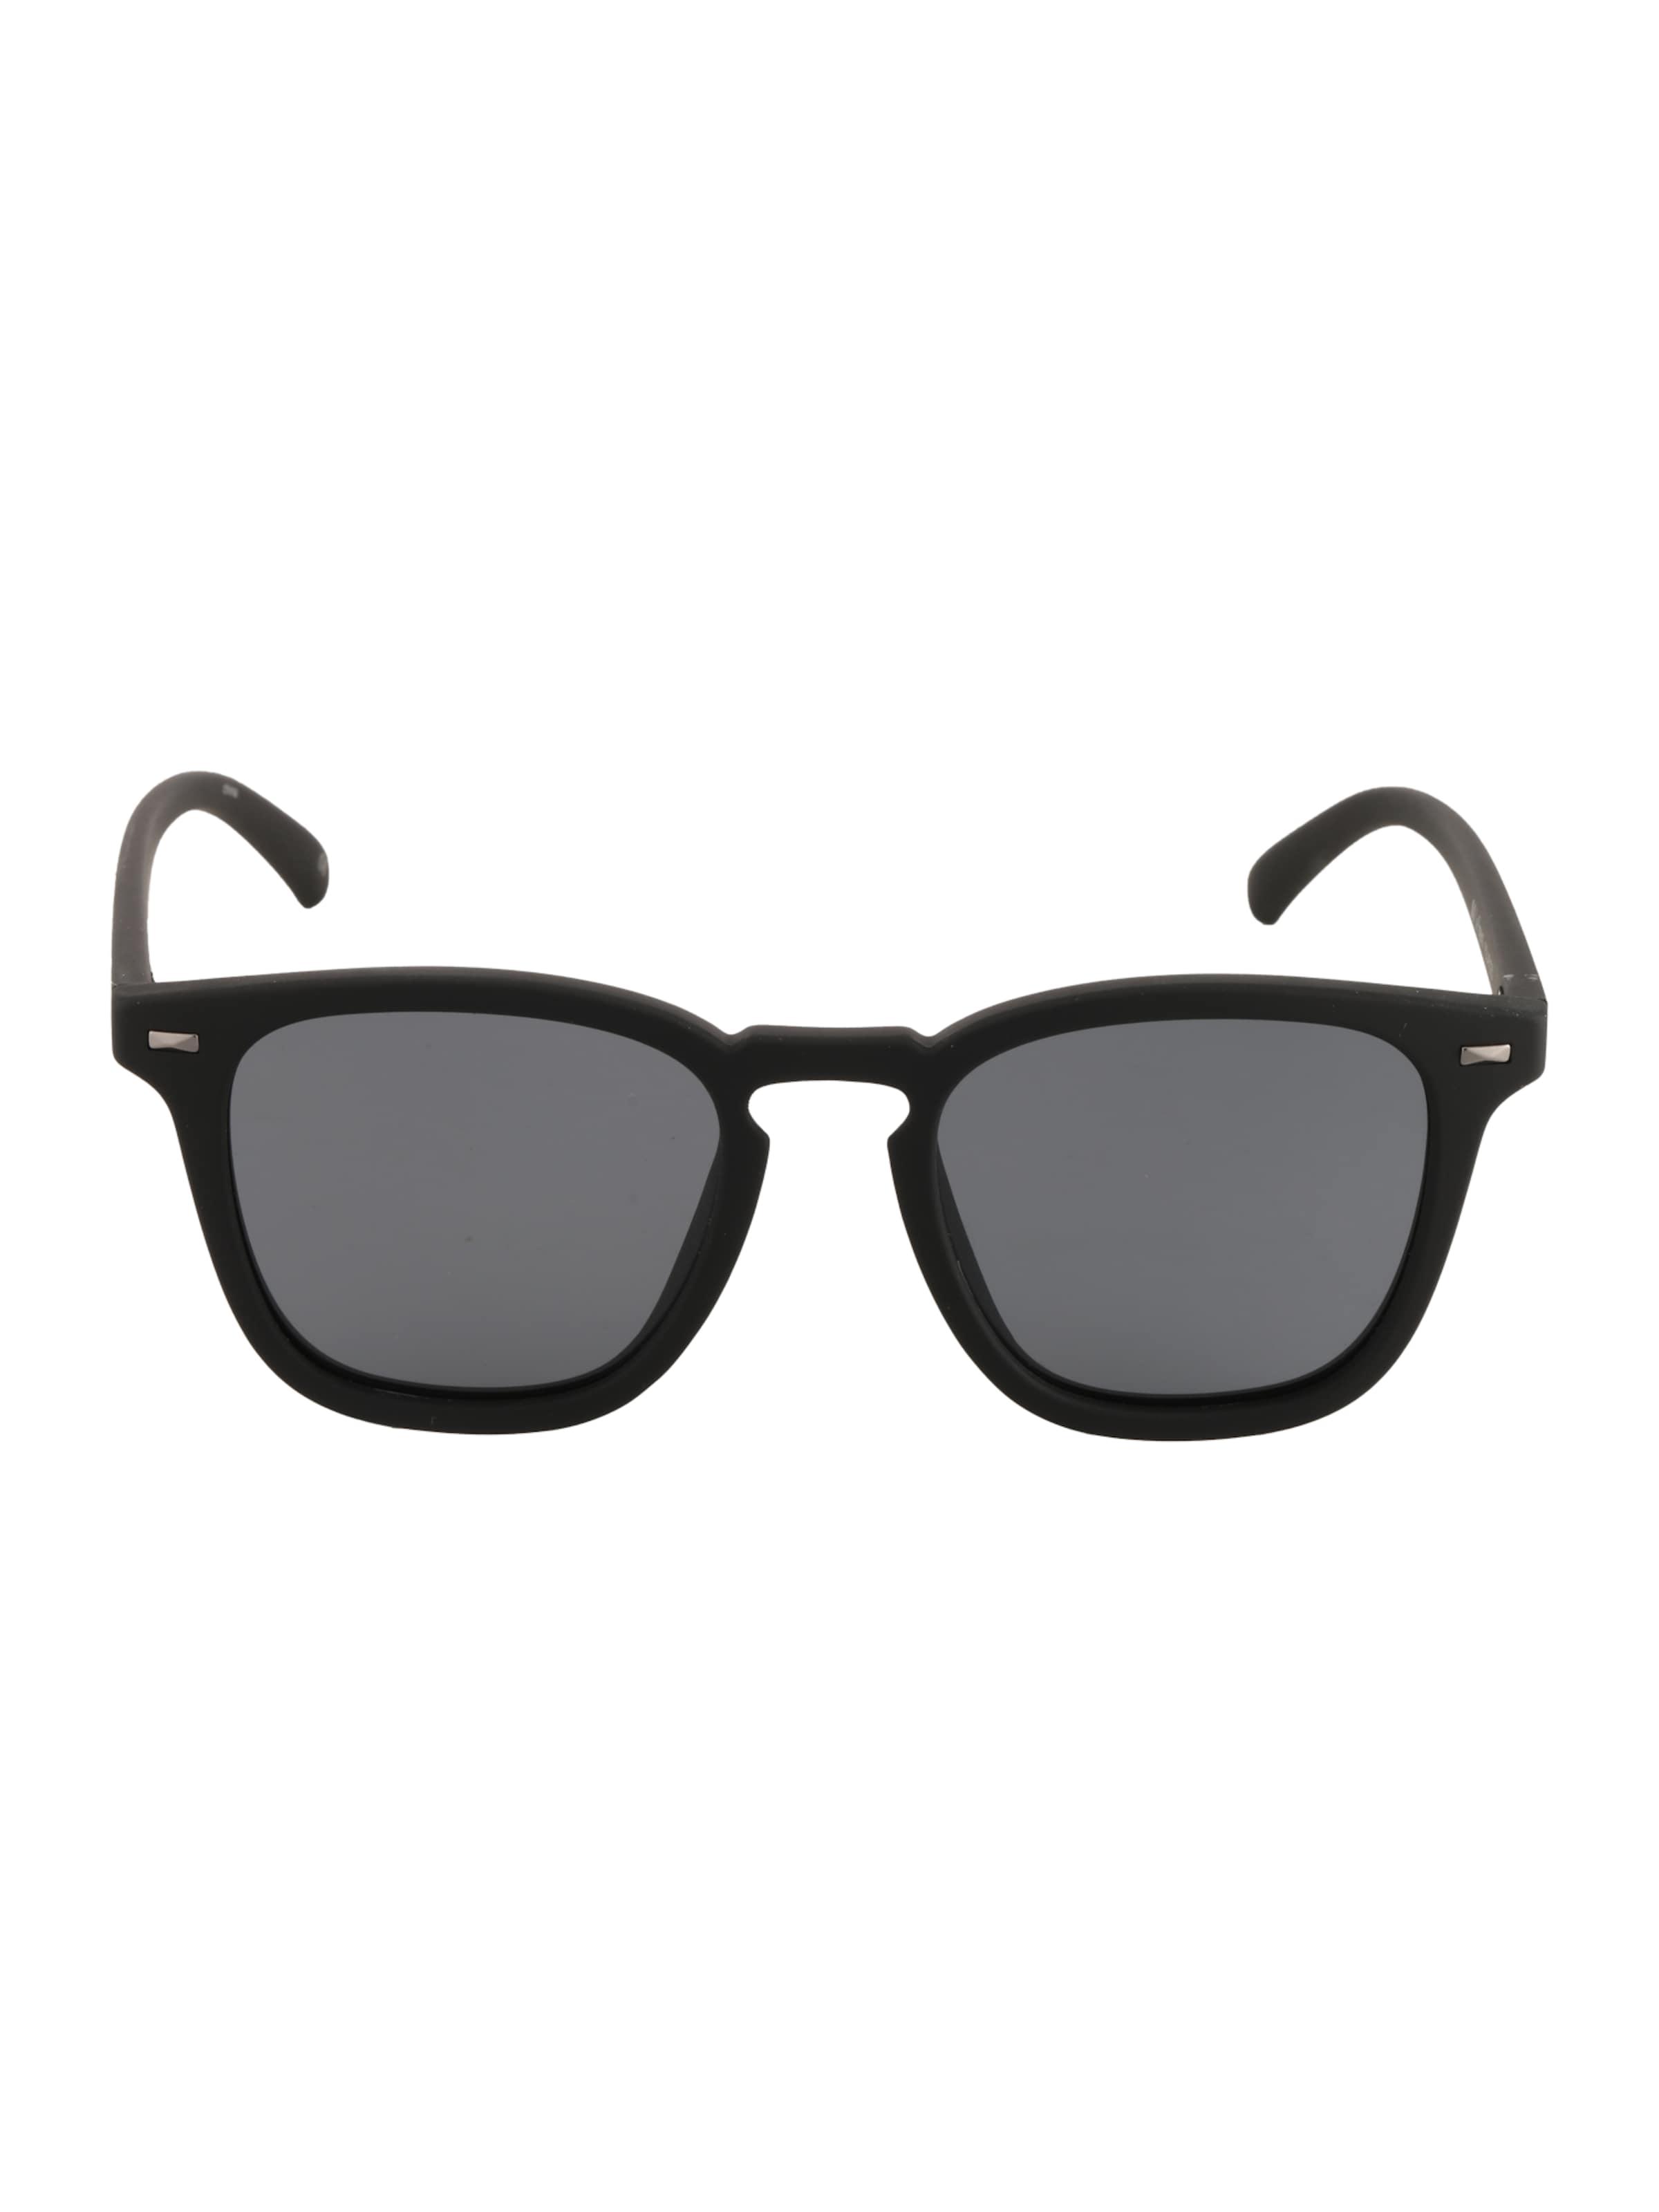 Rabatt Authentische Online LE SPECS Sonnenbrille 'NO BIGGIE' Billig Rabatt Authentisch Kostengünstig Rabatt-Websites MNSsO